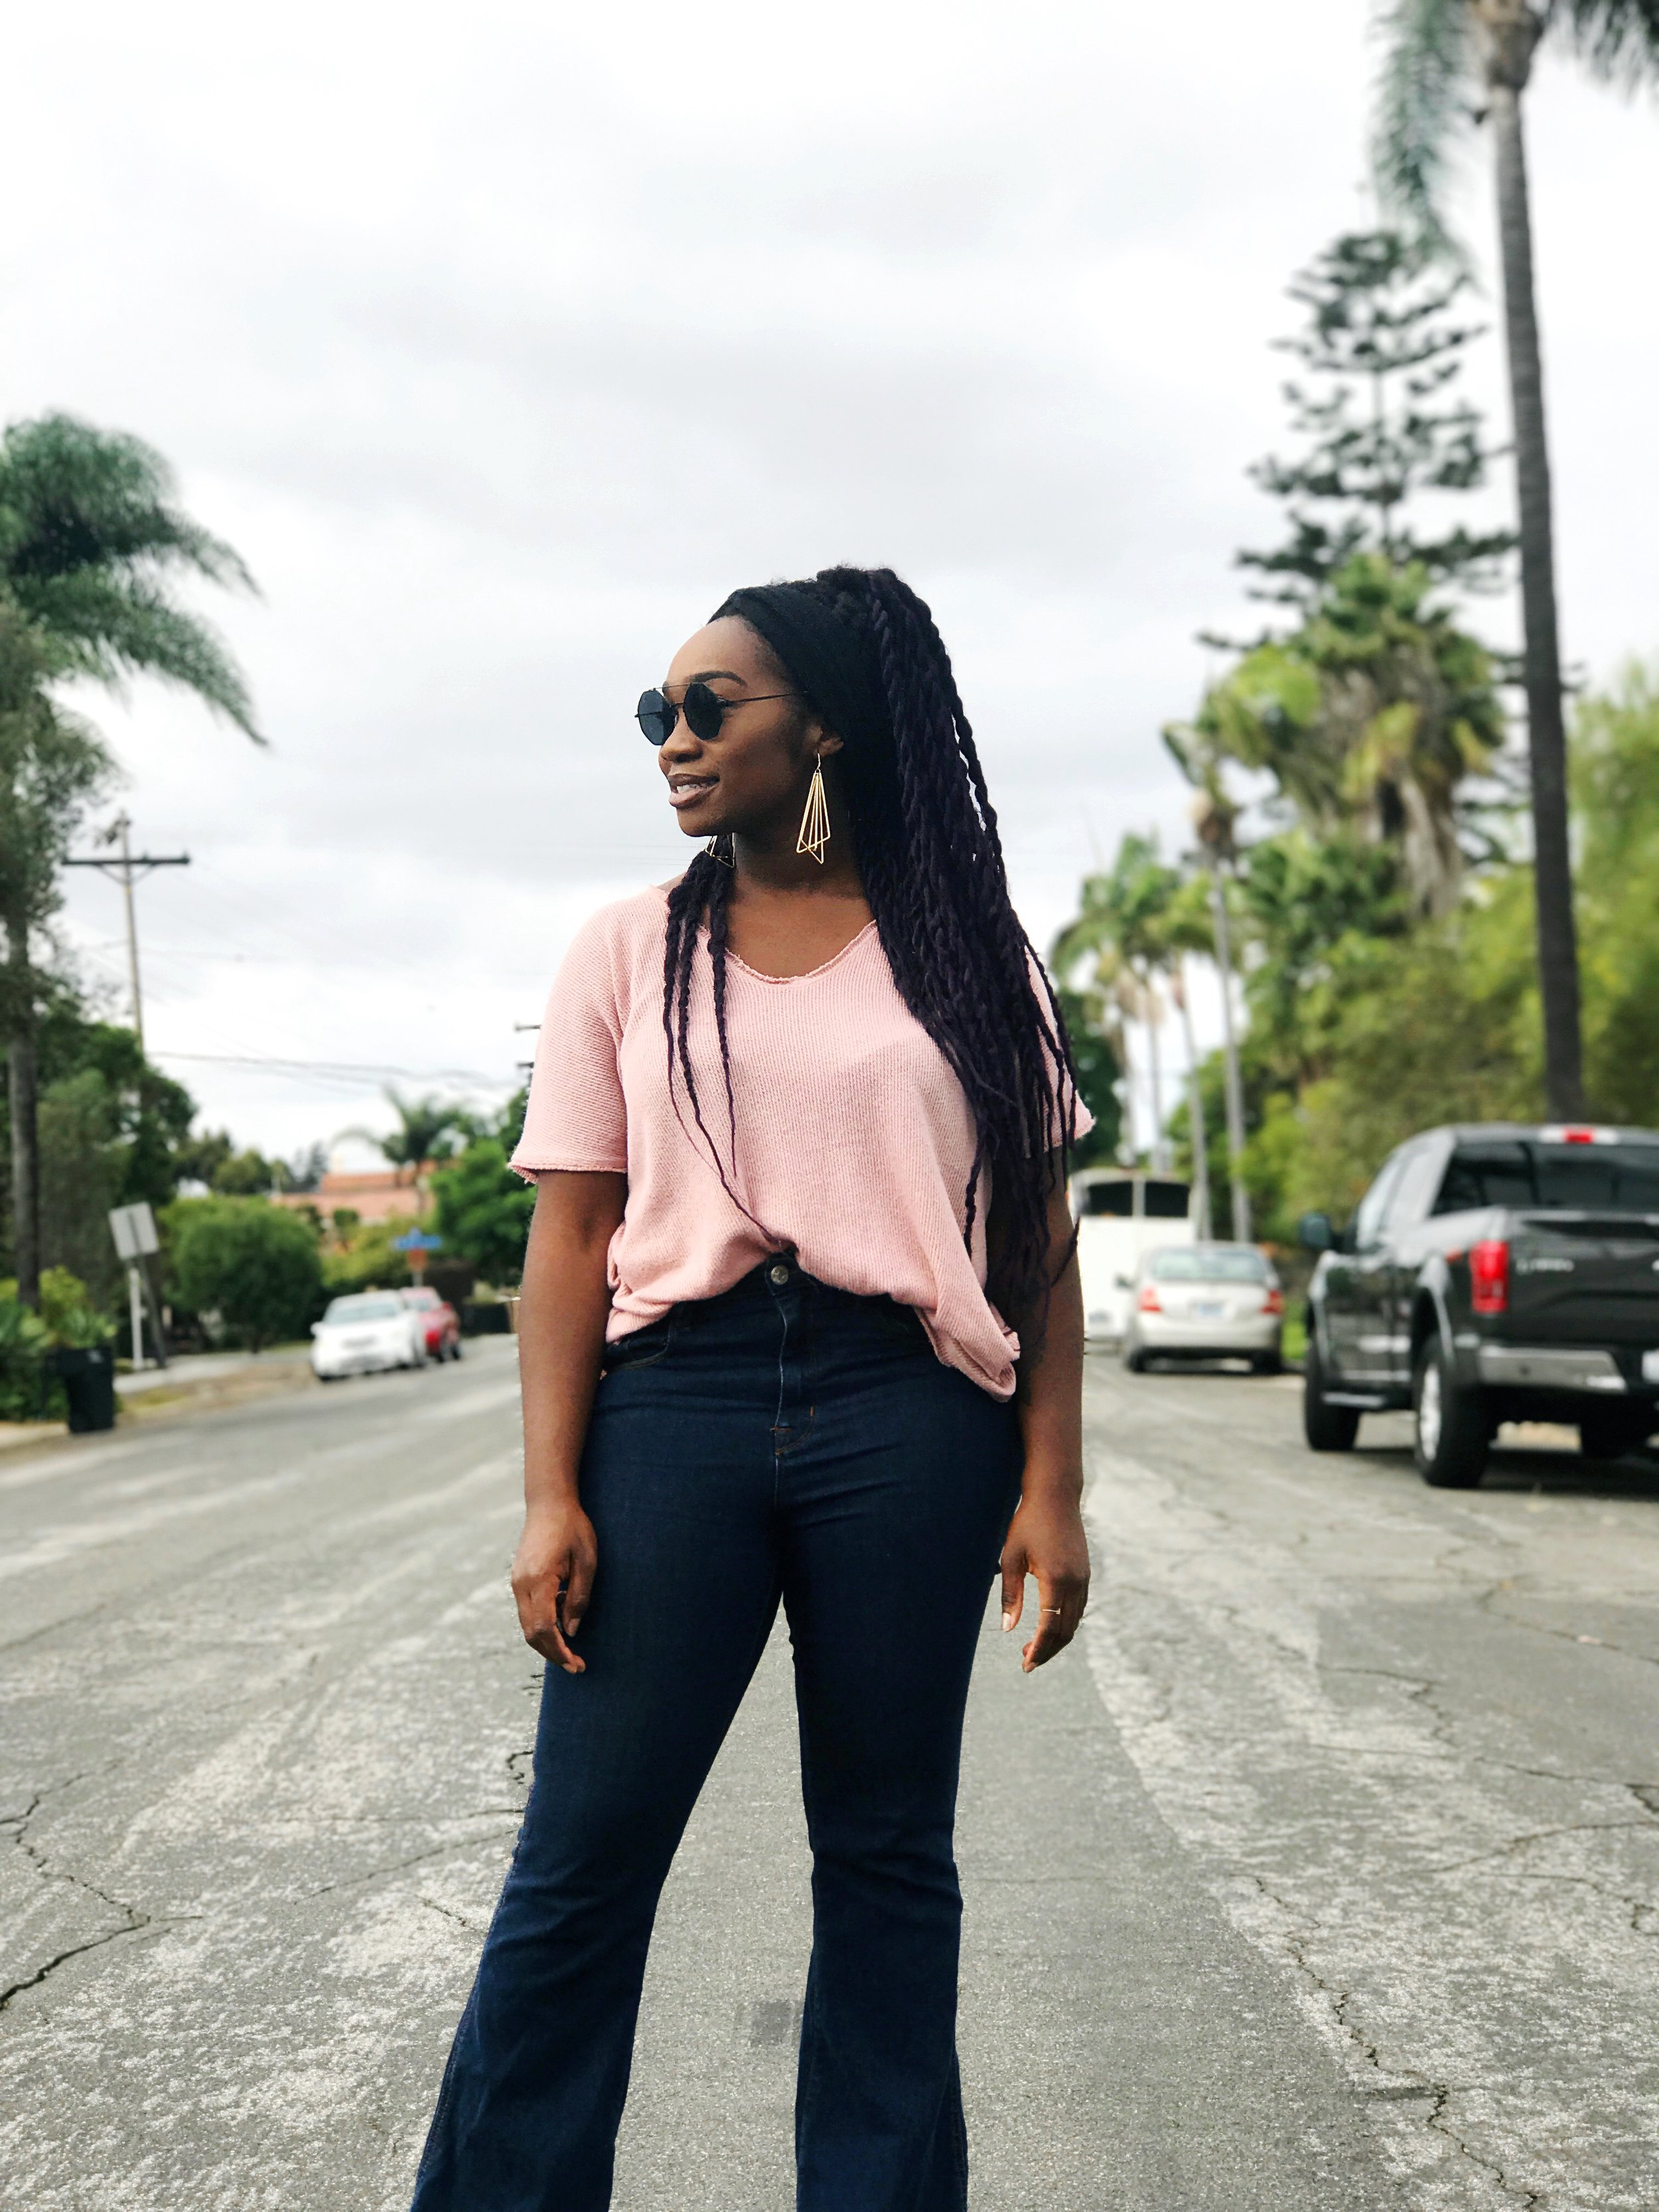 Black woman wearing pink shirt half tucked into bell bottom jeans #blackgirlmagic